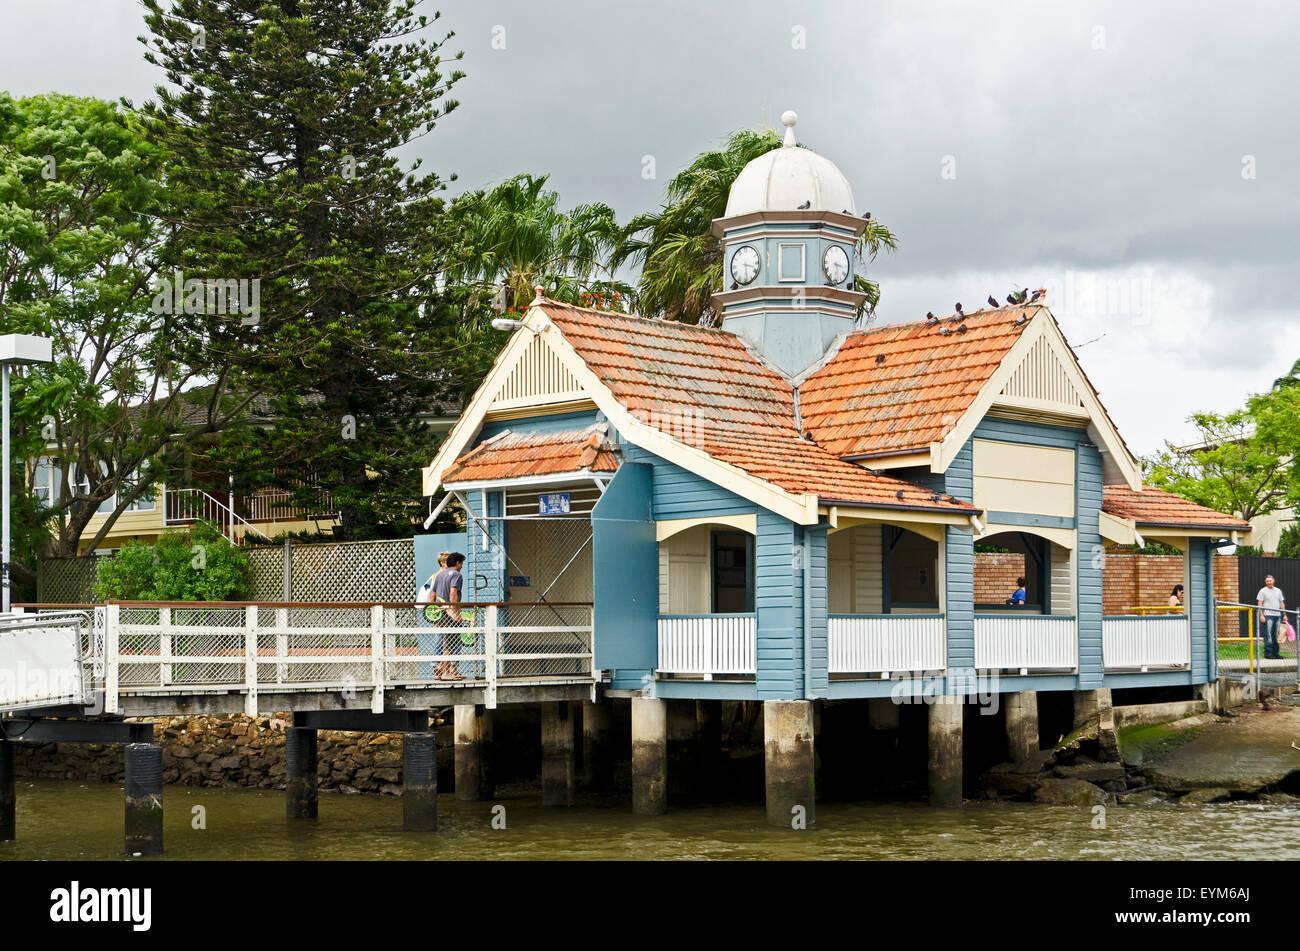 Australia, Brisbane, River, landing station of the Citycats, - Stock Image